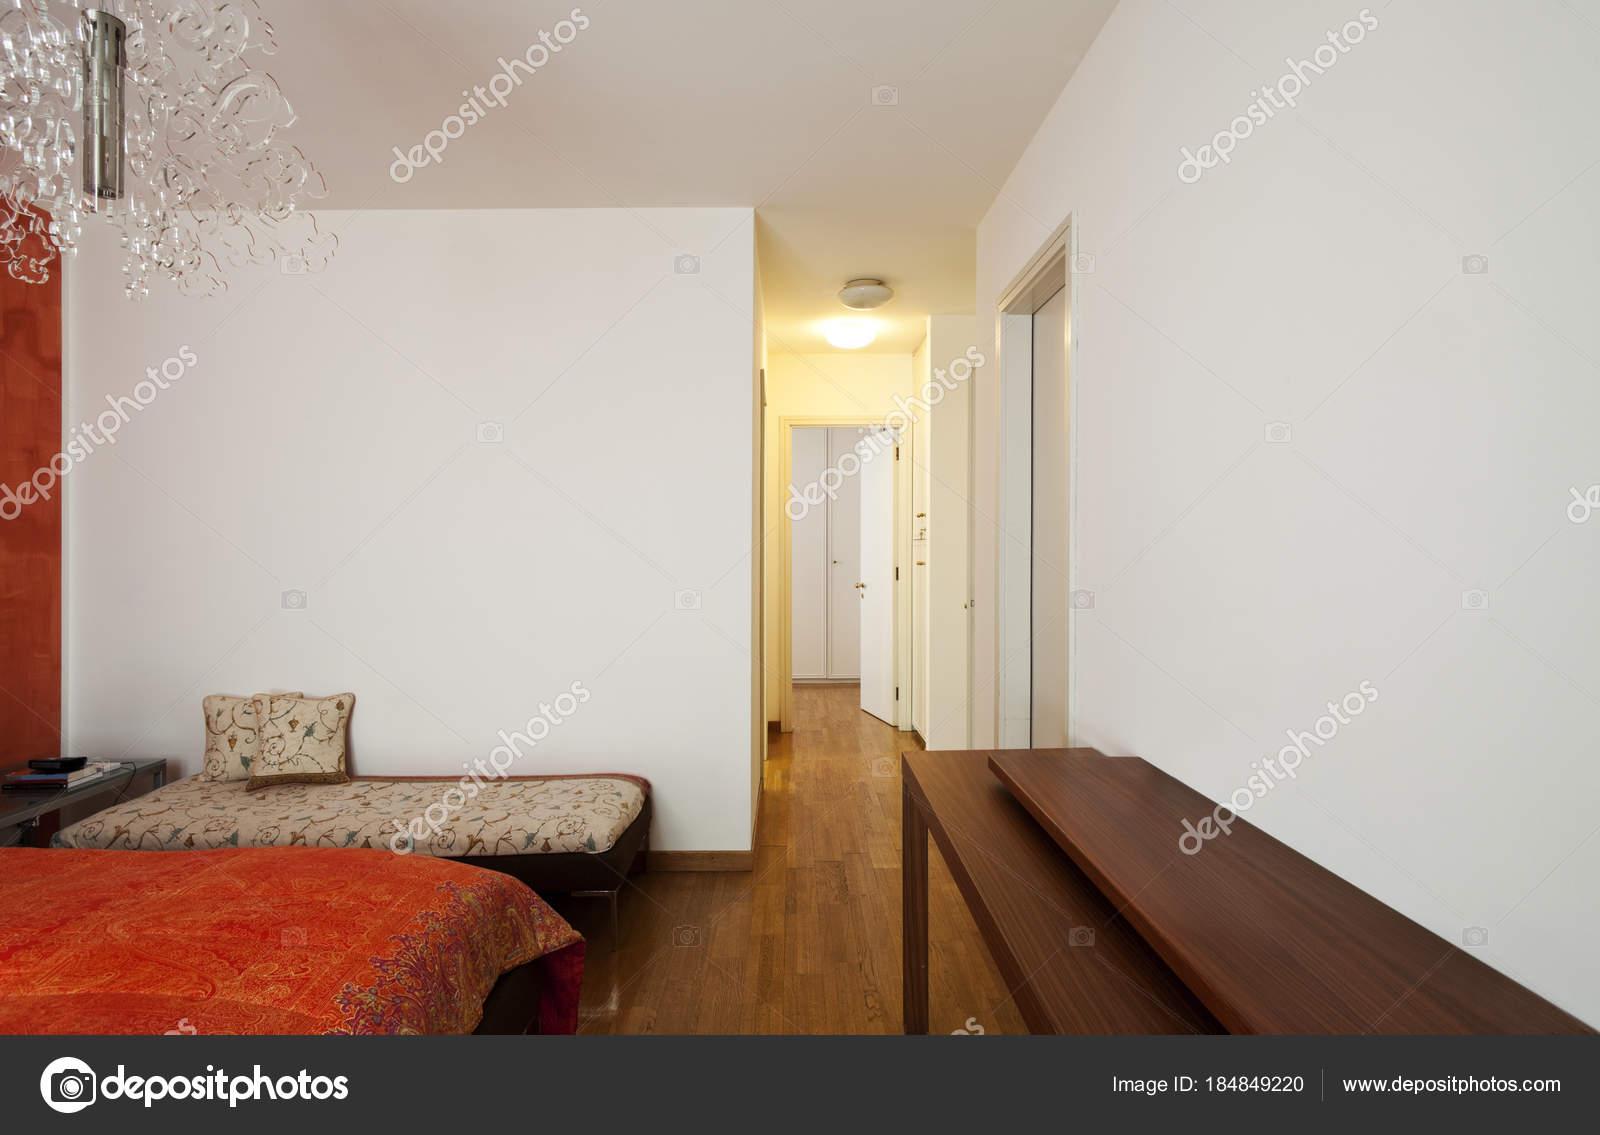 Orange and white bedroom interior — Stock Photo © Zveiger #184849220